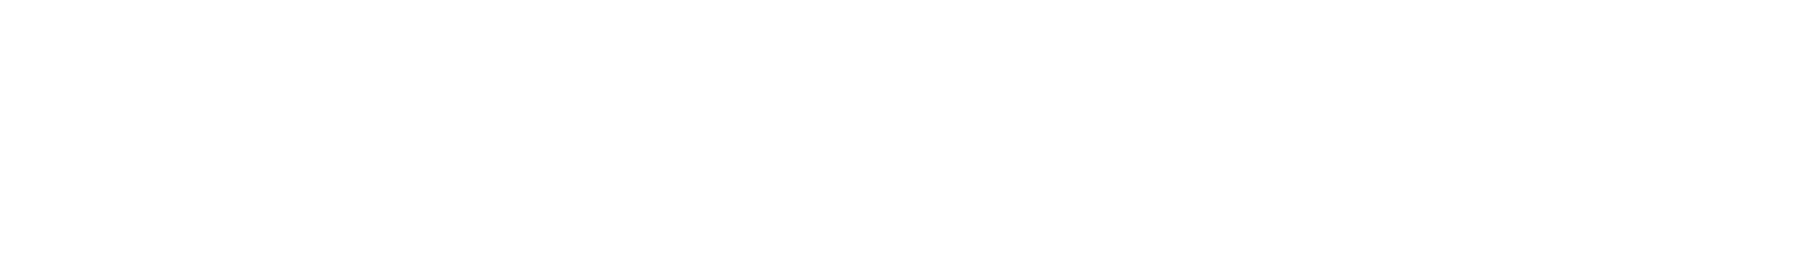 ehu basslp 128 004 db